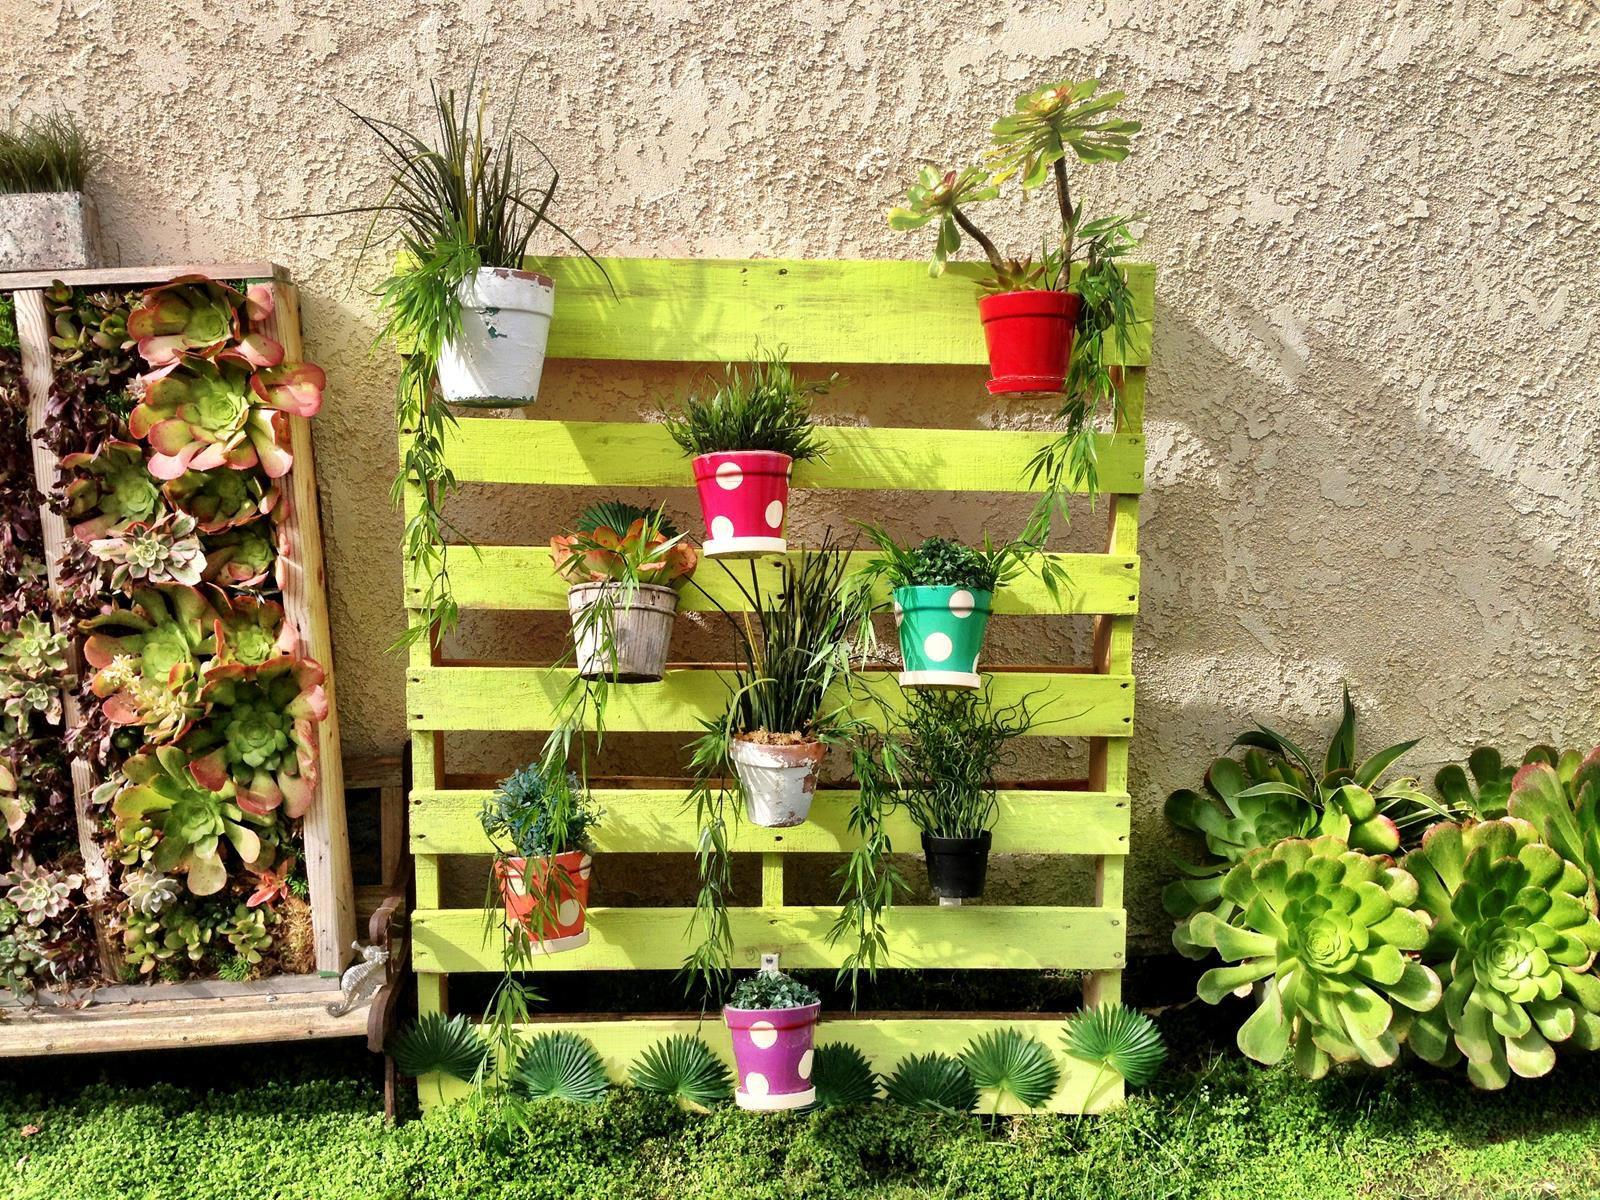 Pleasing To The Palletpallet Garden Painted Pots Of Succulents On Pallet Using Hangapot Hangers